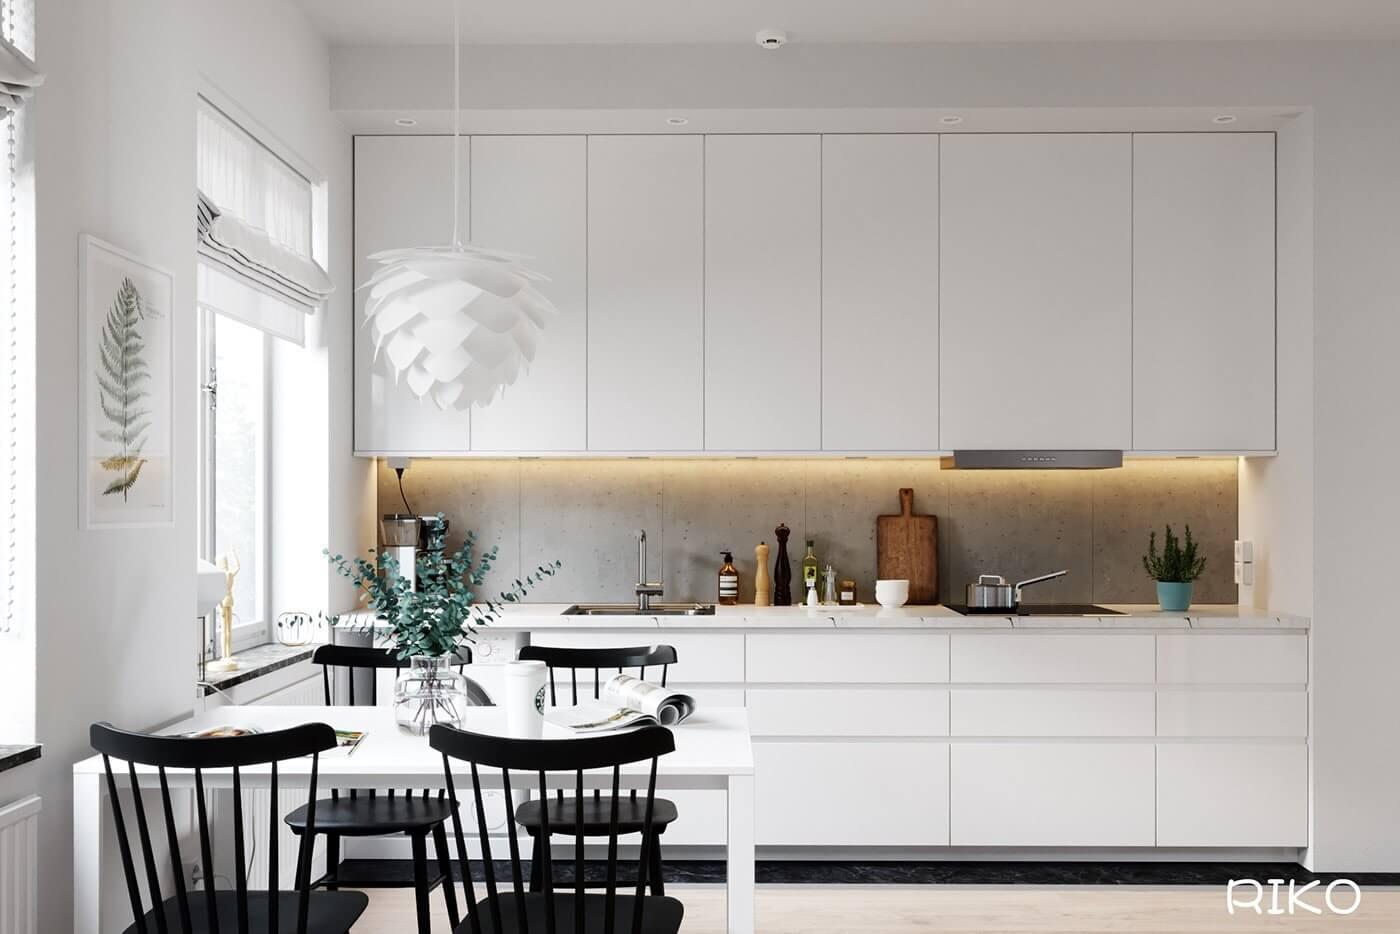 White kitchen design dining table - cgi visualization